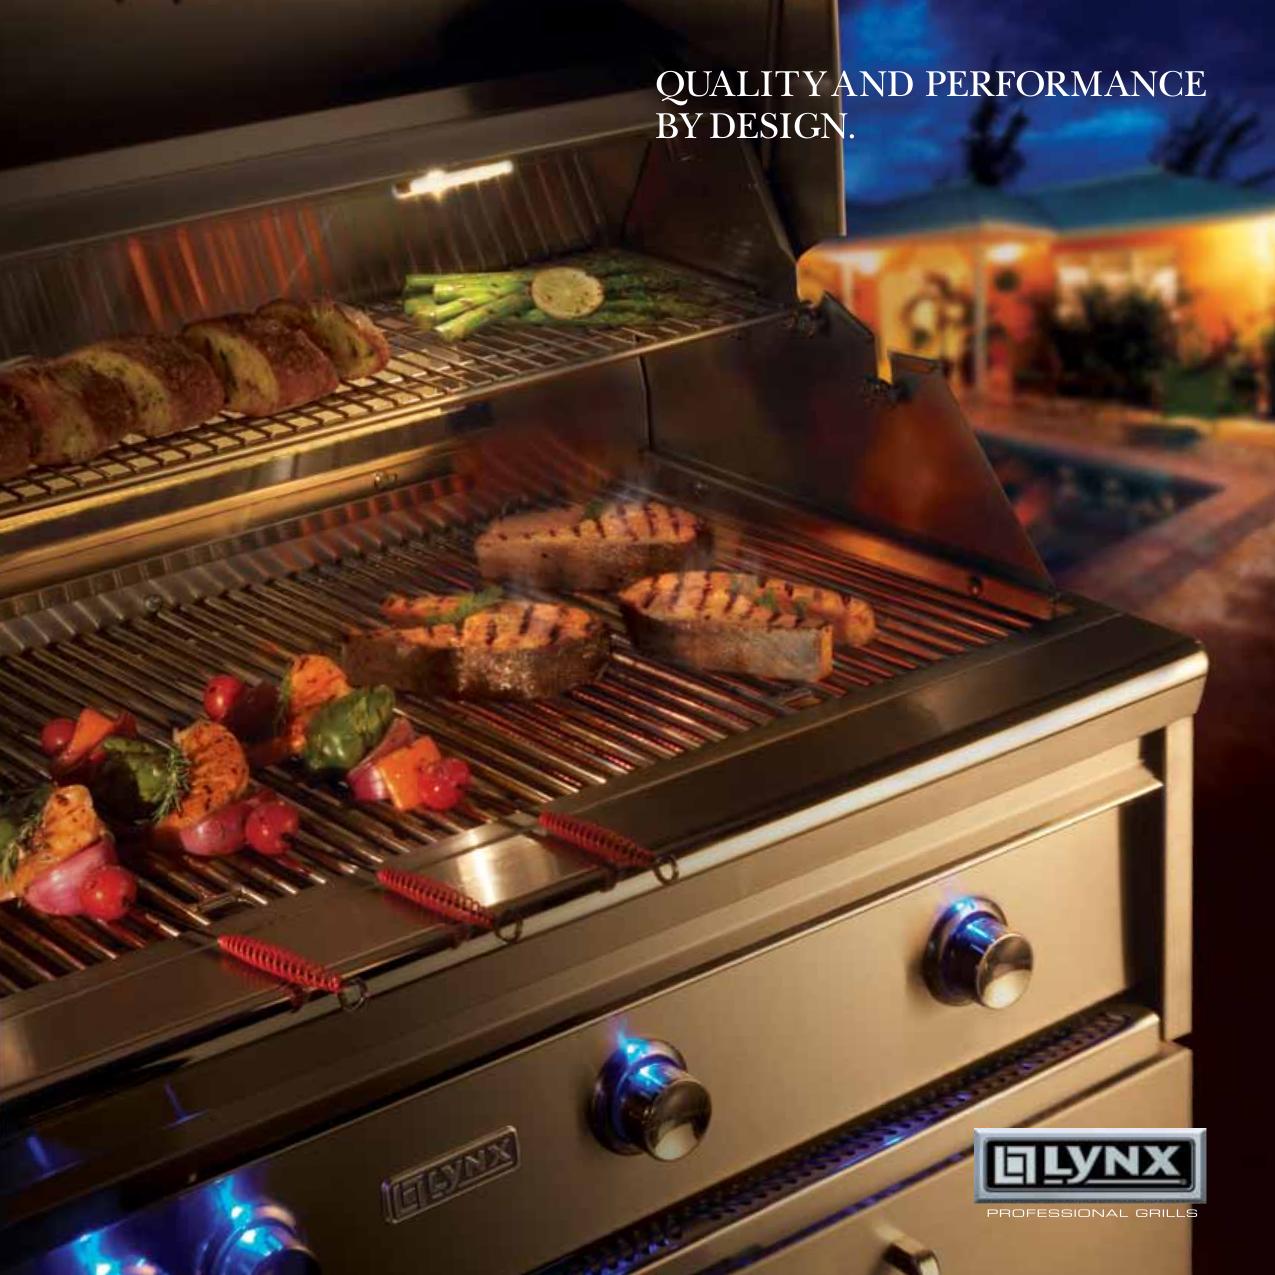 pdf for lynx grill l36psfr1 manual - Lynx Grill